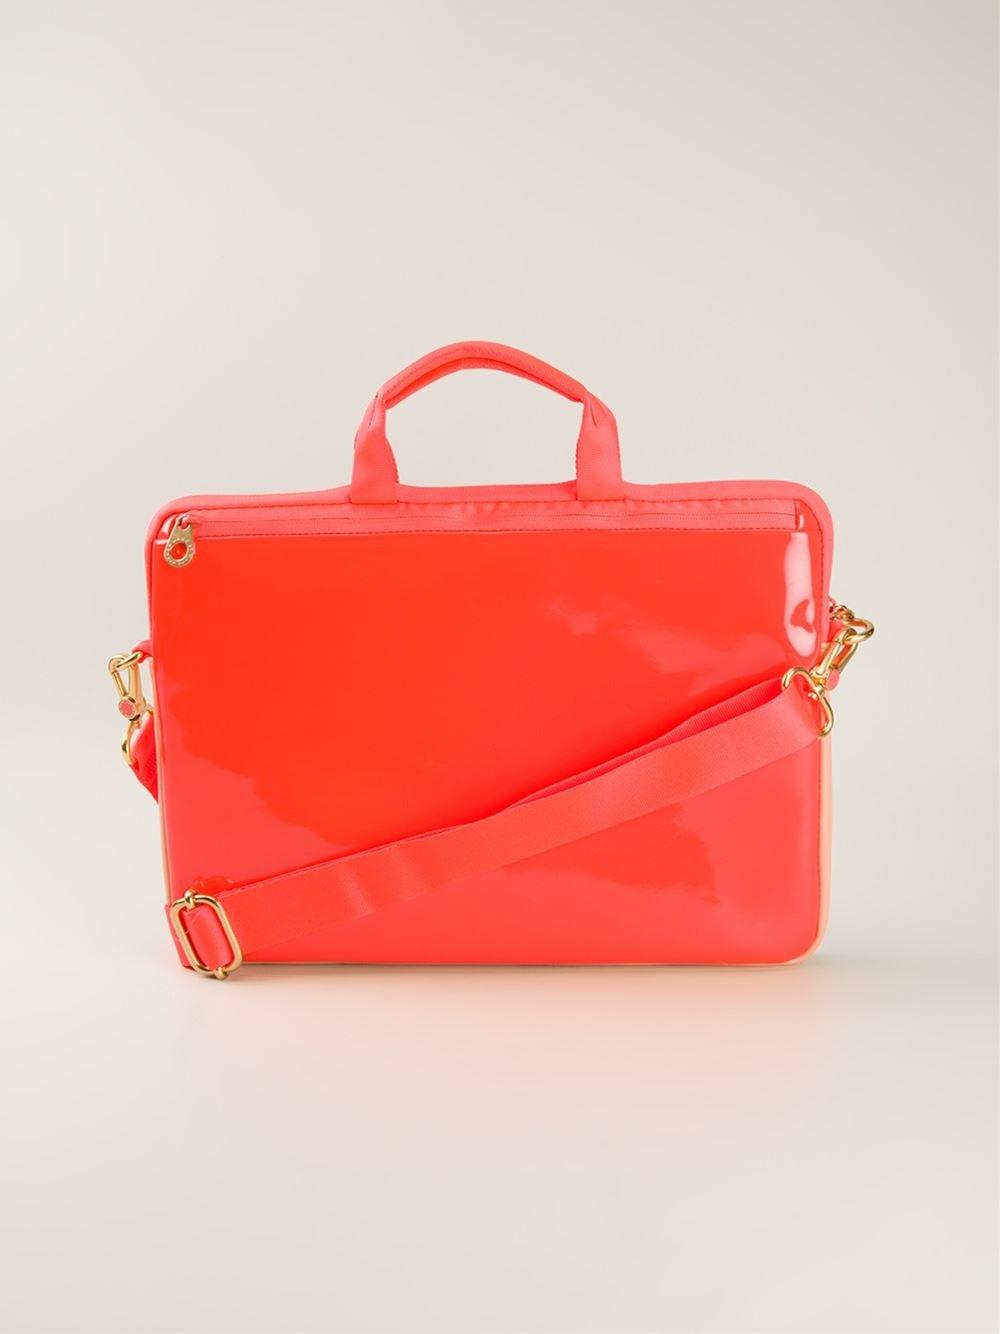 marc by marc jacobs varnished laptop bag in red yellow orange lyst. Black Bedroom Furniture Sets. Home Design Ideas